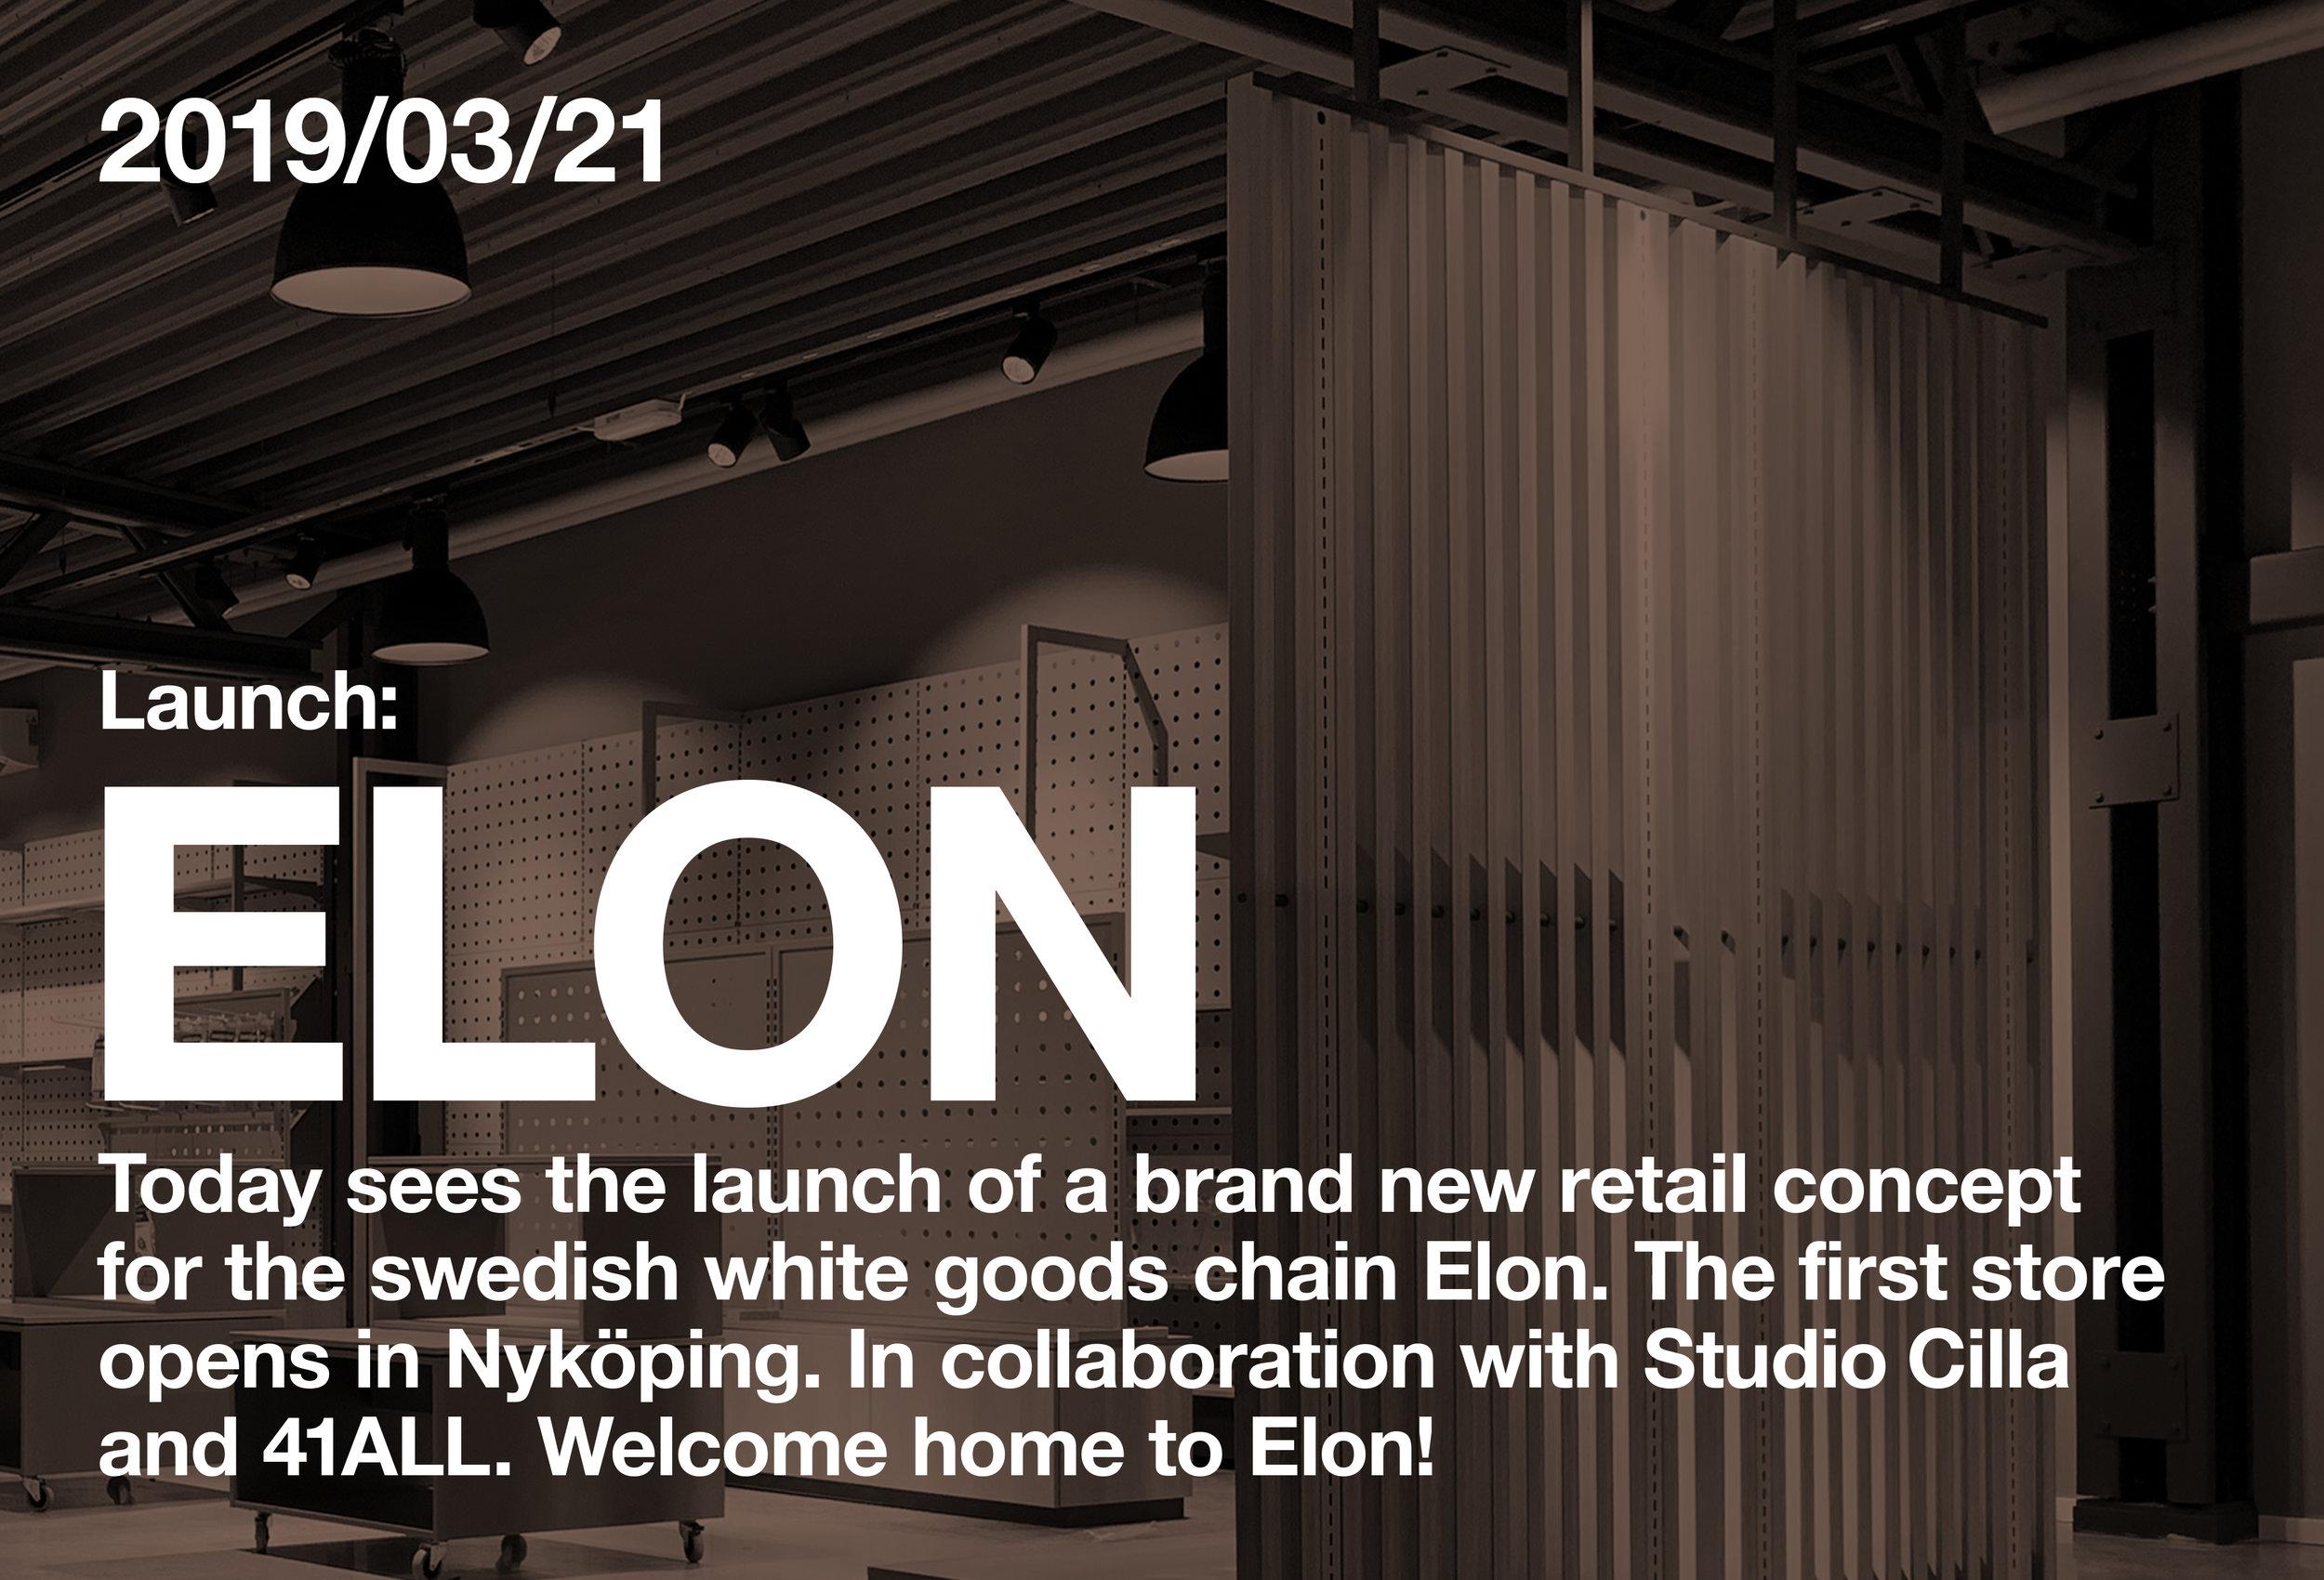 Elon butikskoncept, Elon, Elon butik koncept